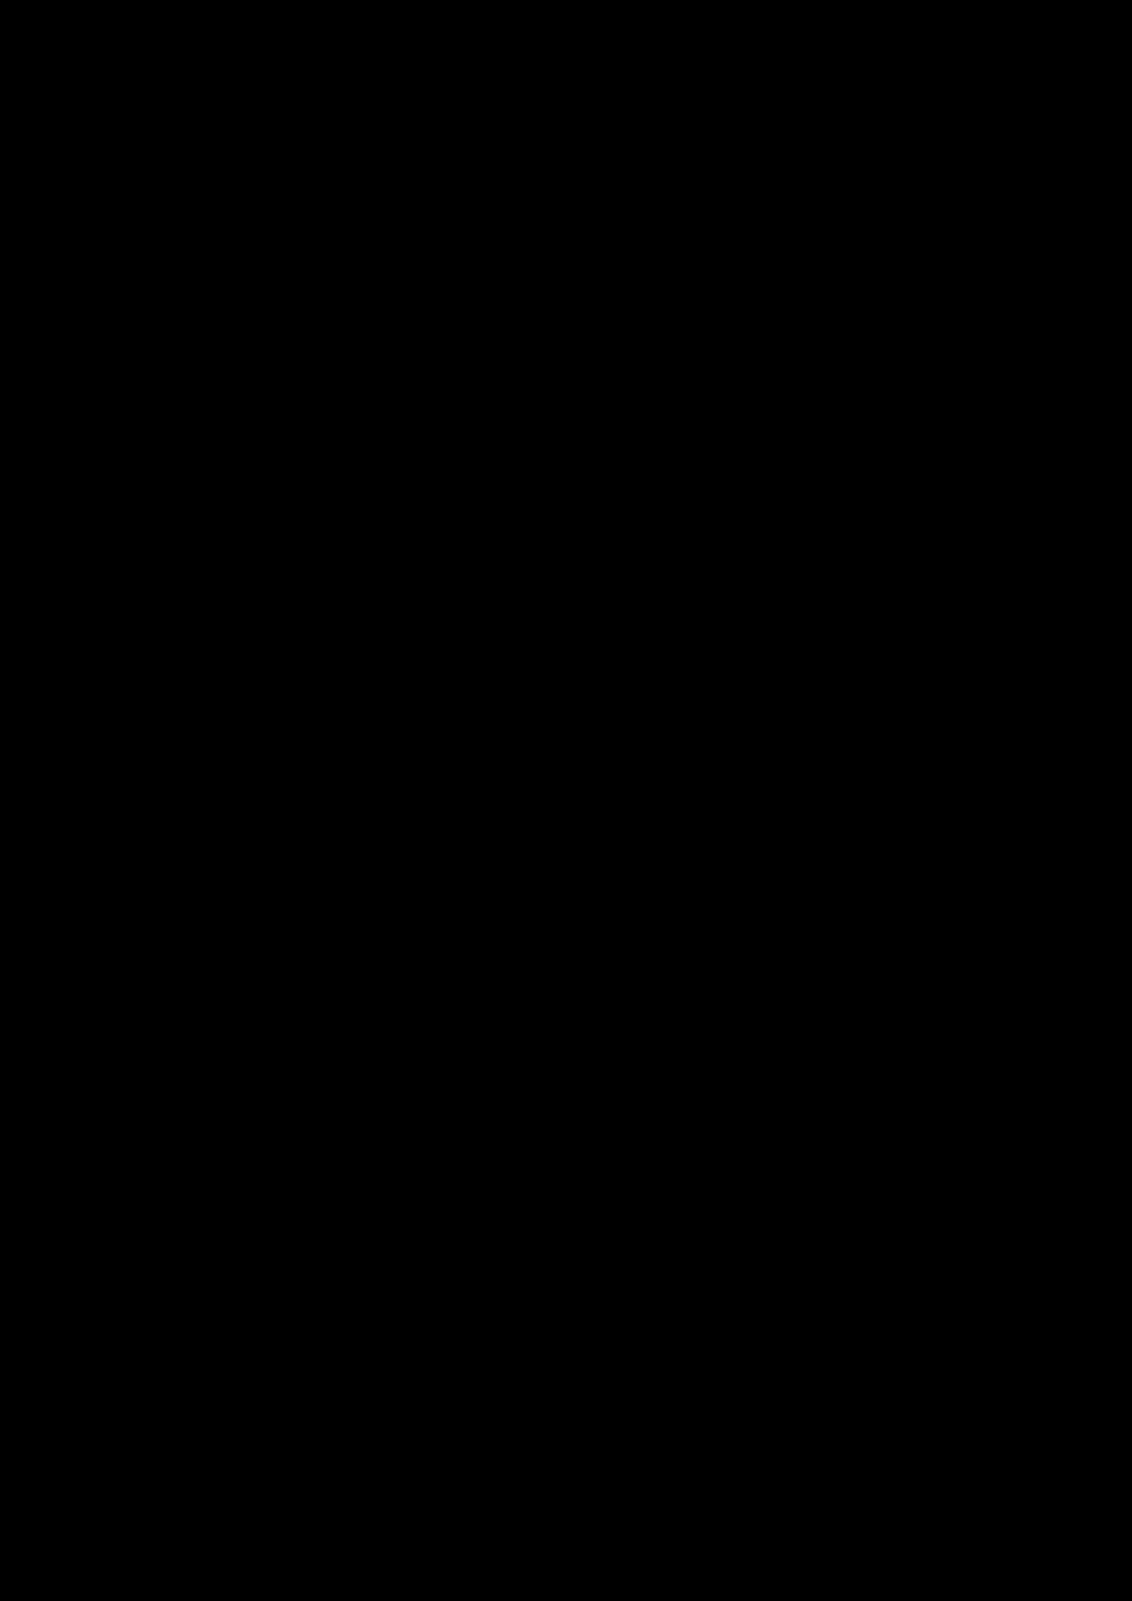 Ten lyubvi slide, Image 43